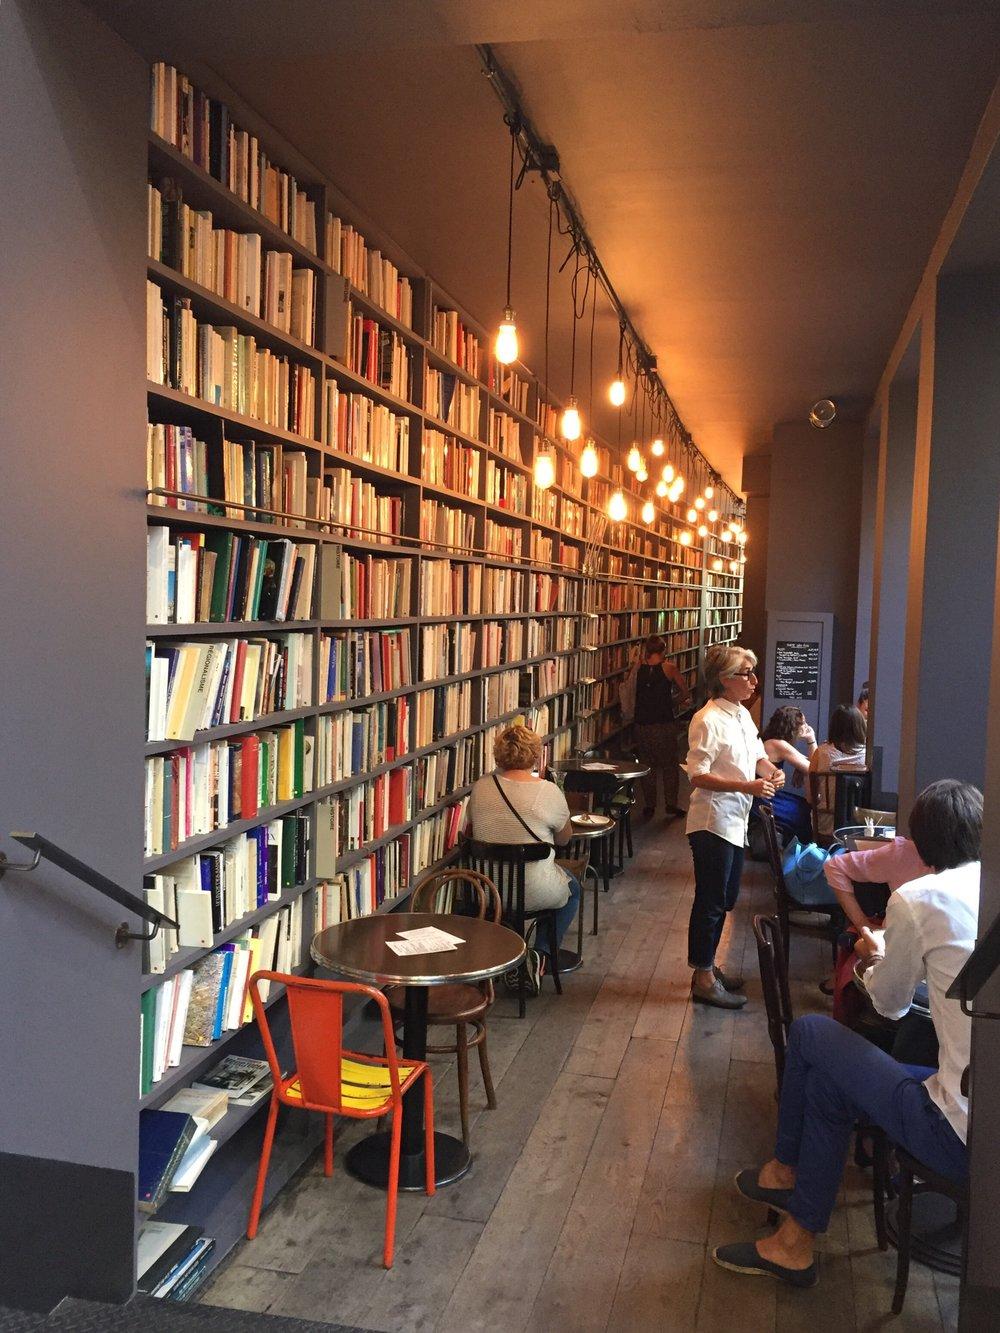 Merci Cafe & Tea Room -最後這也是一張大家都會拍的點.